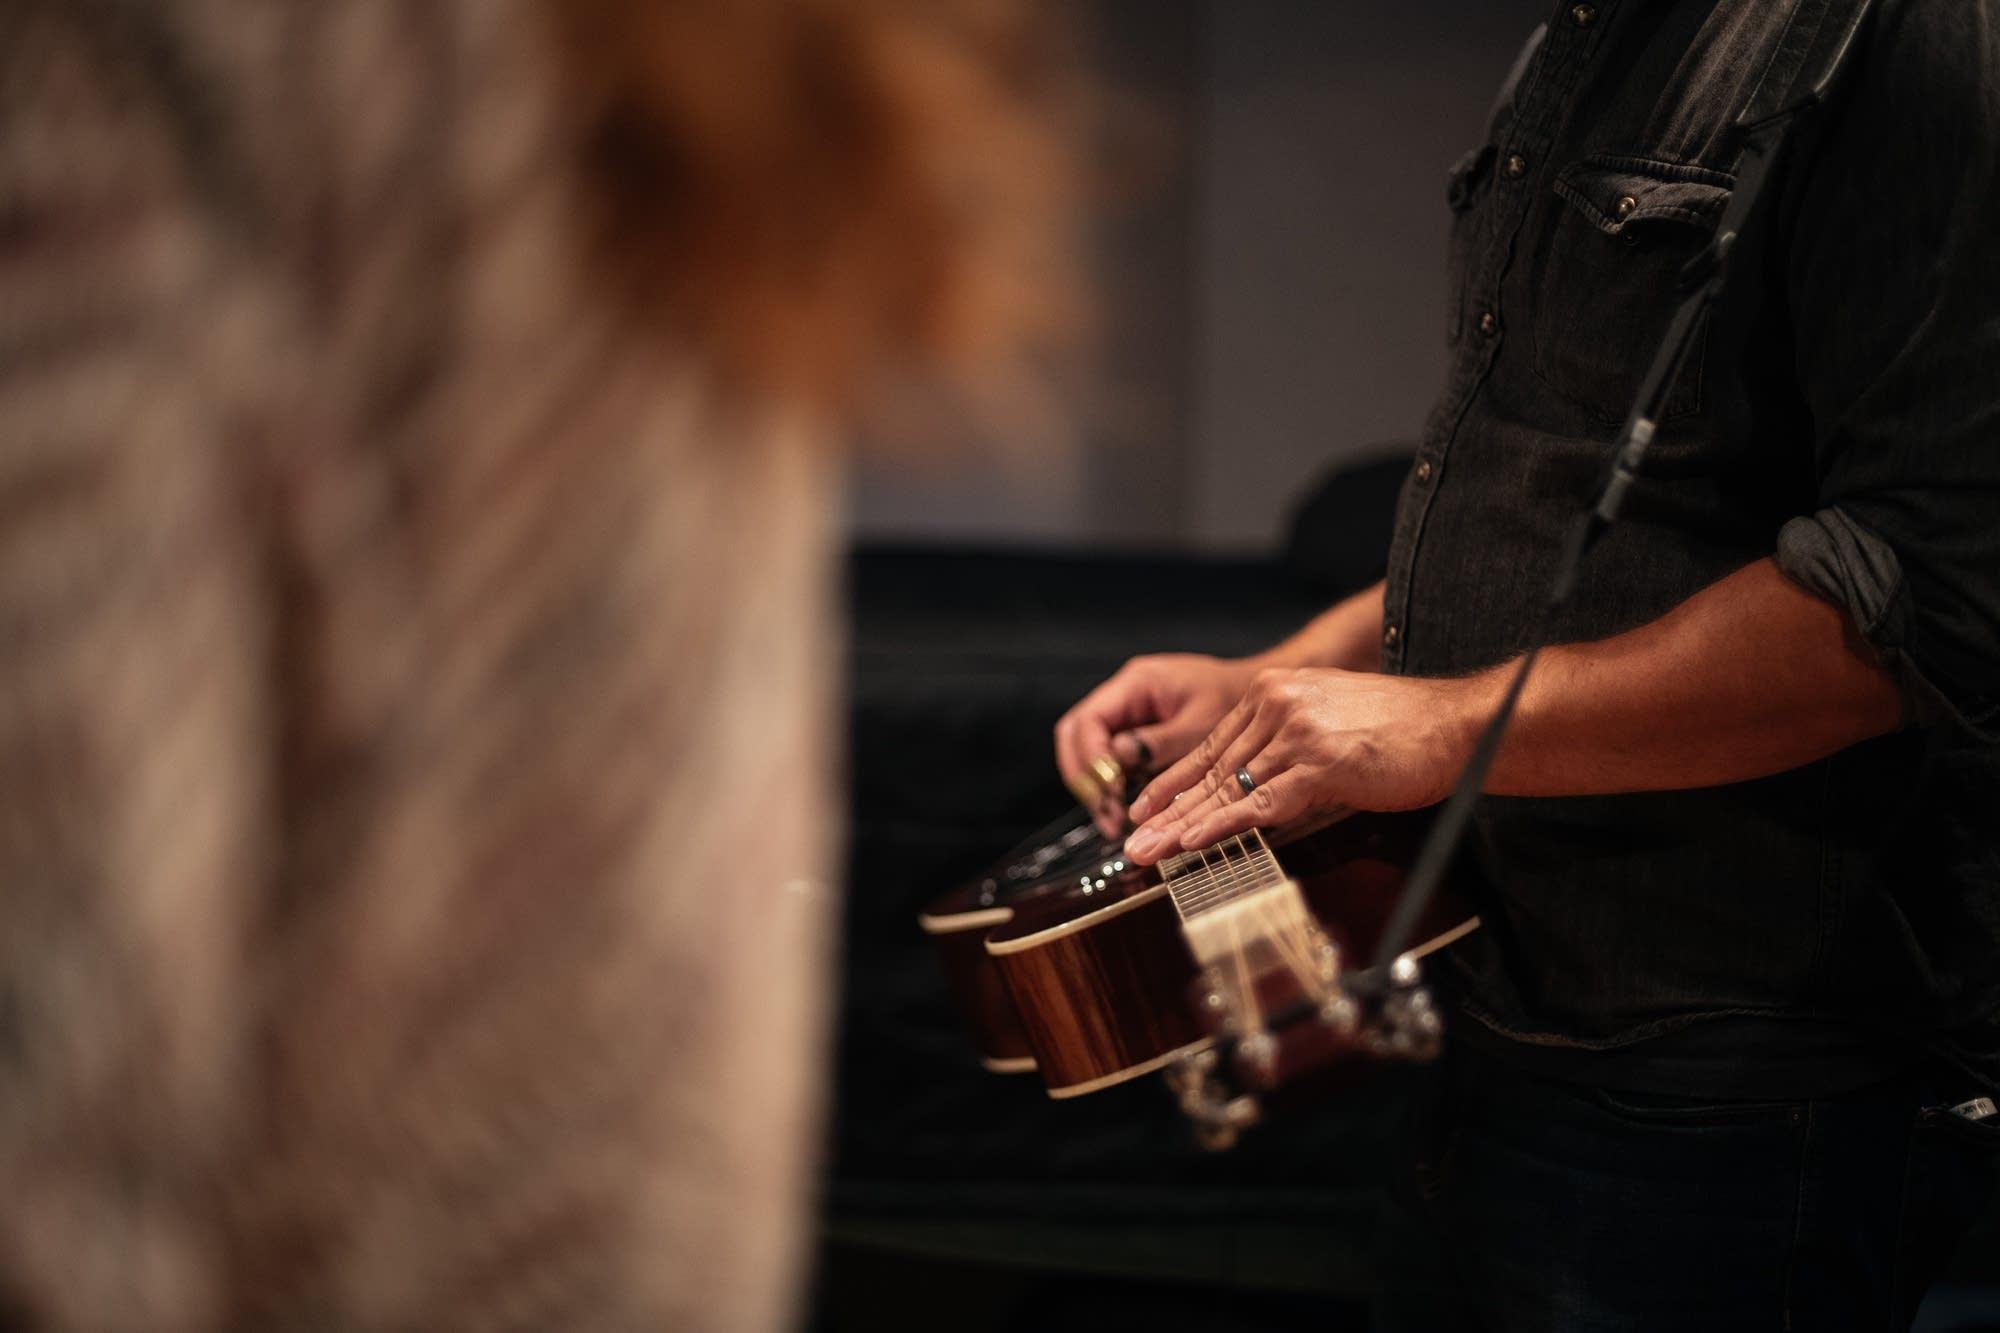 Reina Del Cid performing in The Current studio